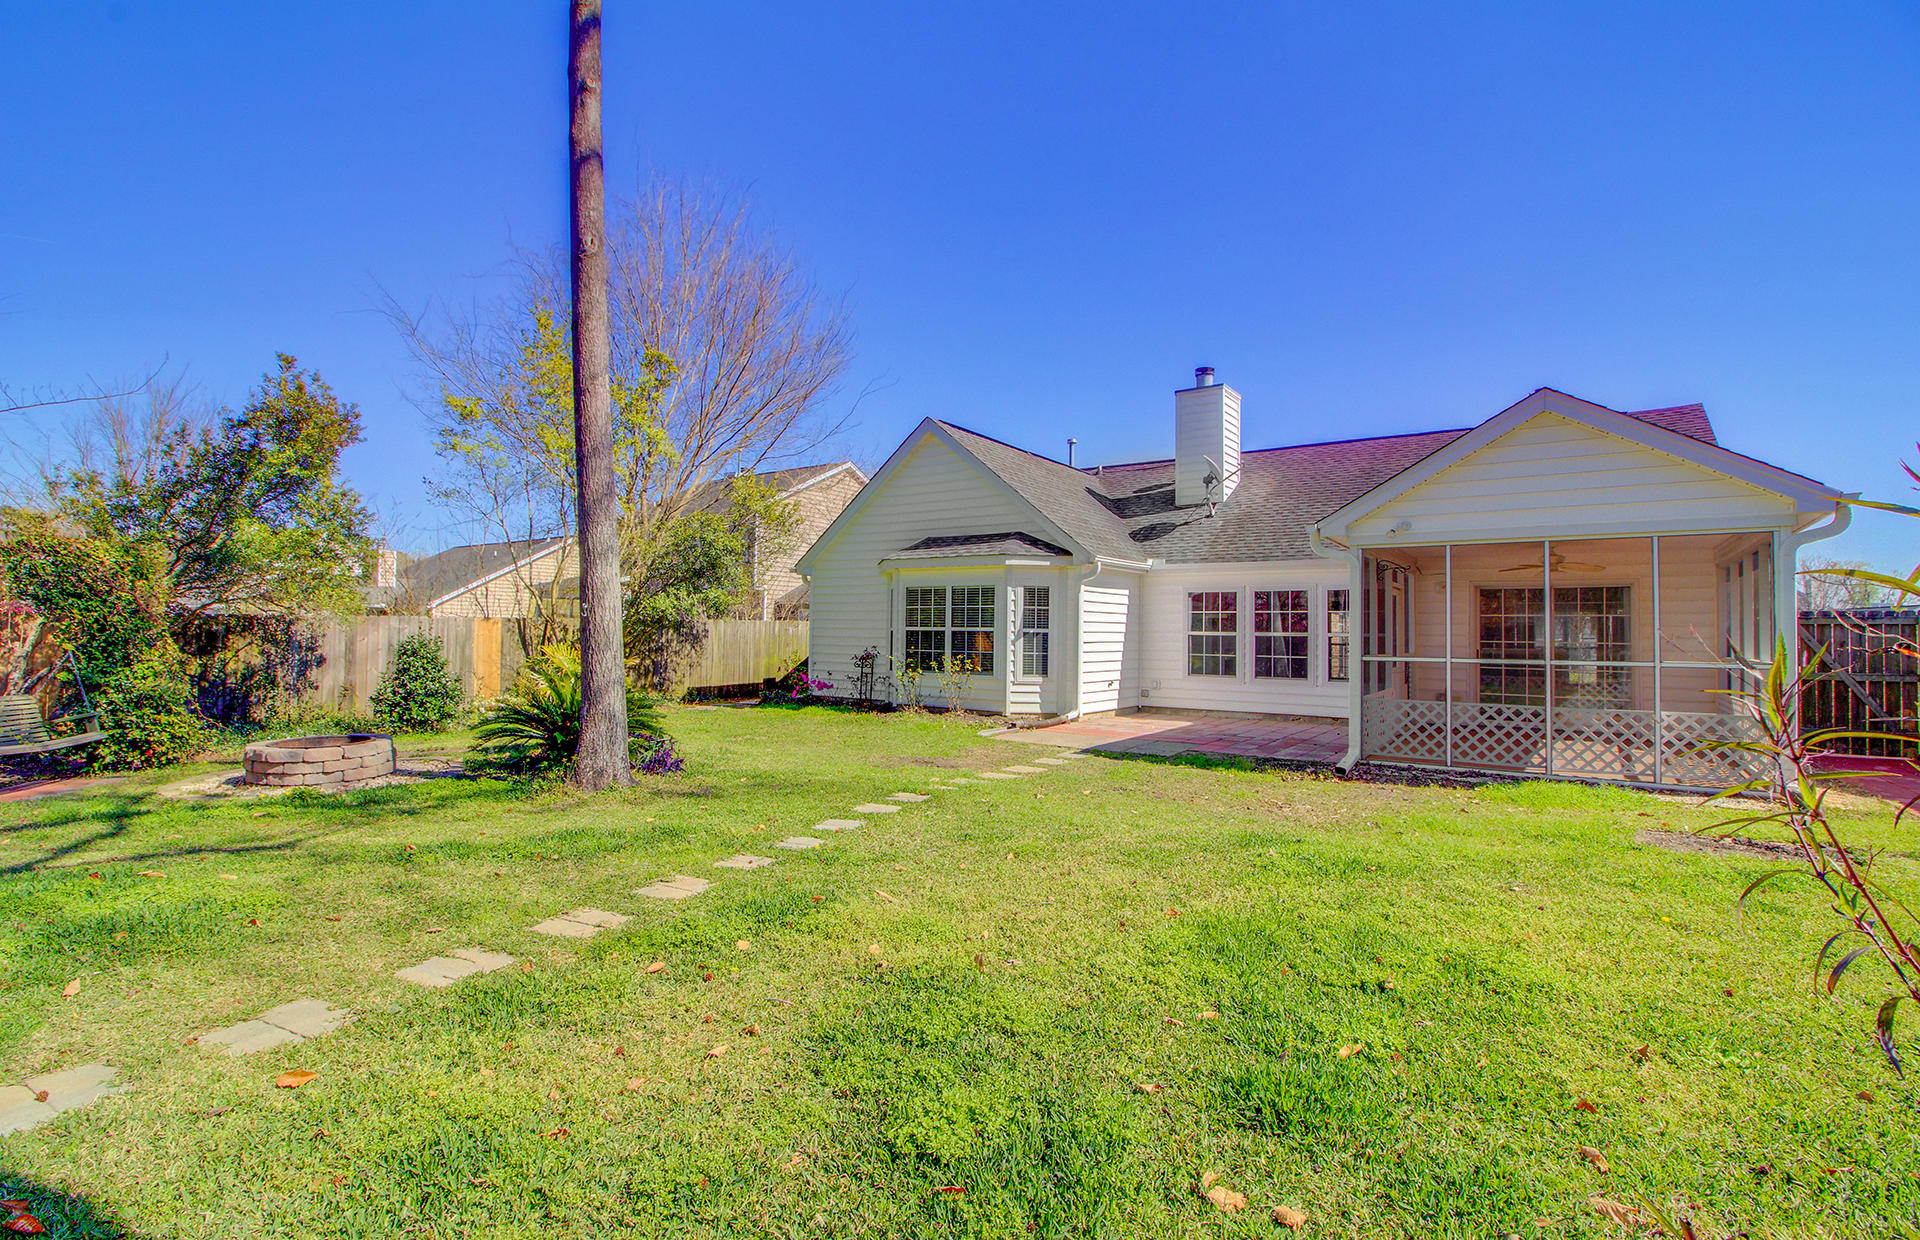 Grand Oaks Plantation Homes For Sale - 789 Bent Hickory, Charleston, SC - 29